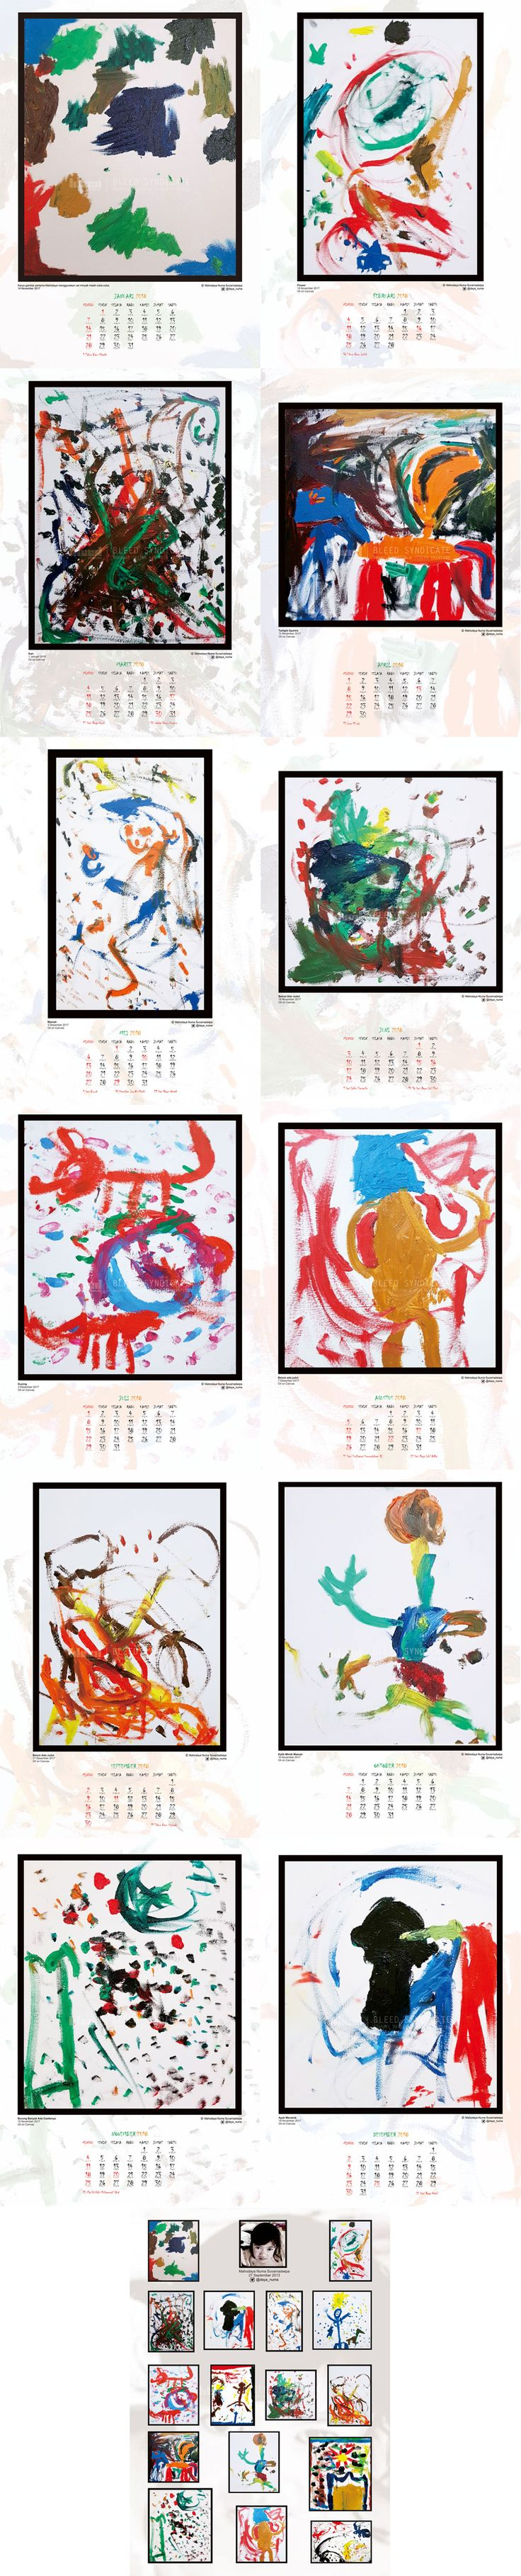 Calendar 2018 design for paintings from @daya_numa © 2018 @bleedsyndicate